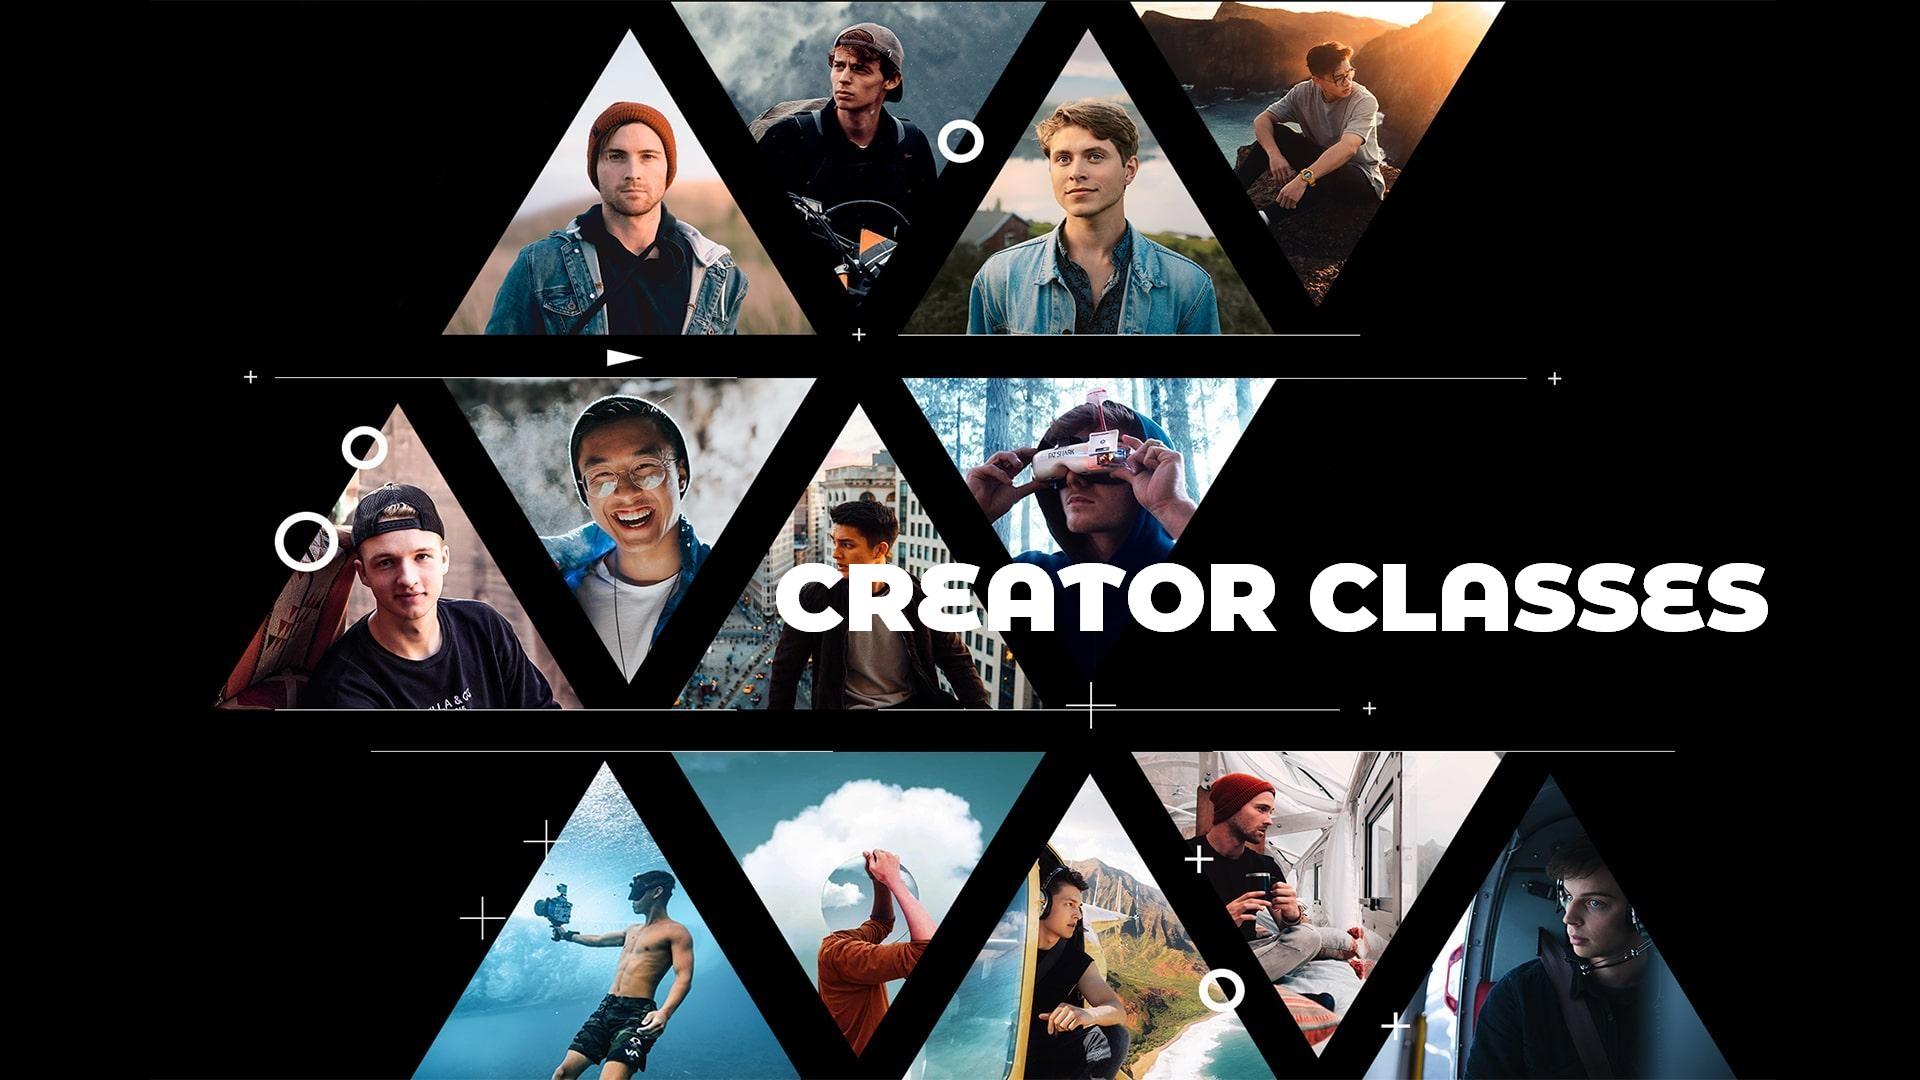 Creatorclasses - Creator Class